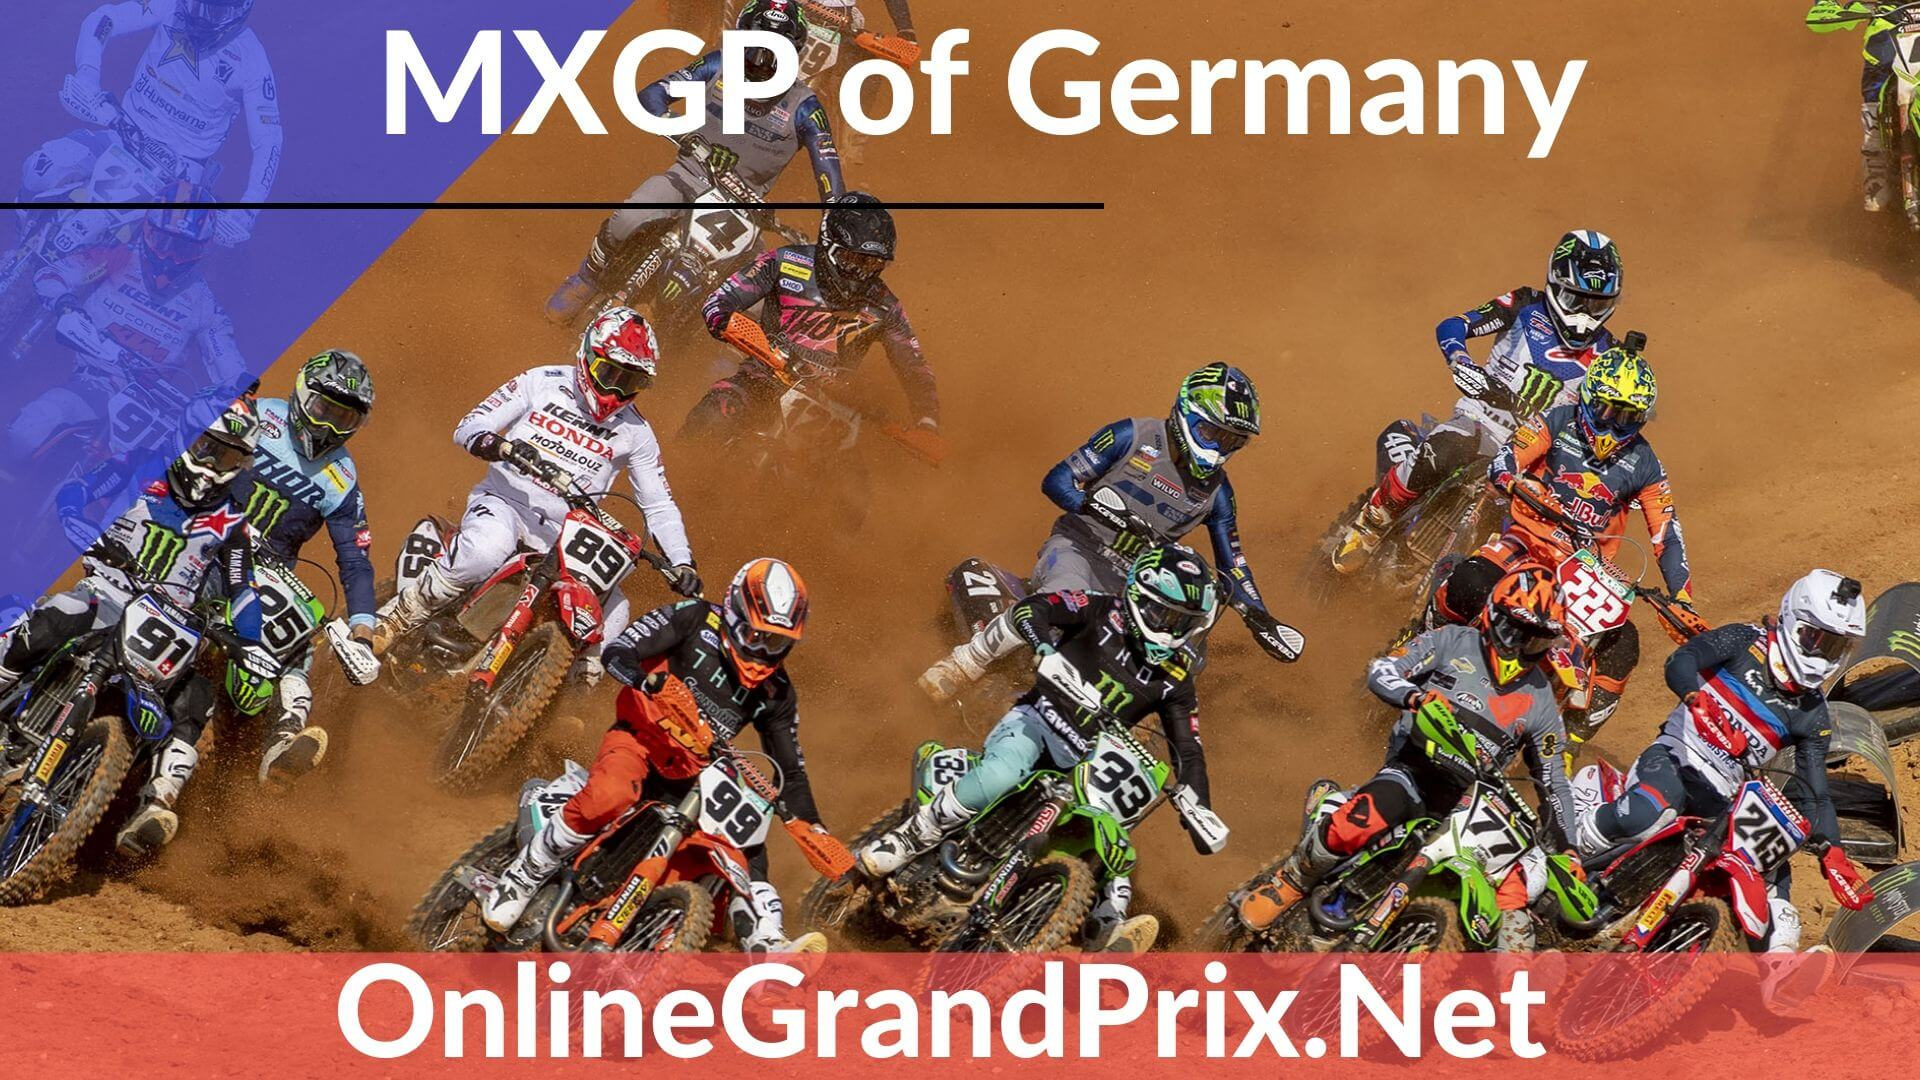 Germany MXGP Live Stream 2020 | FIM MotoCross WC